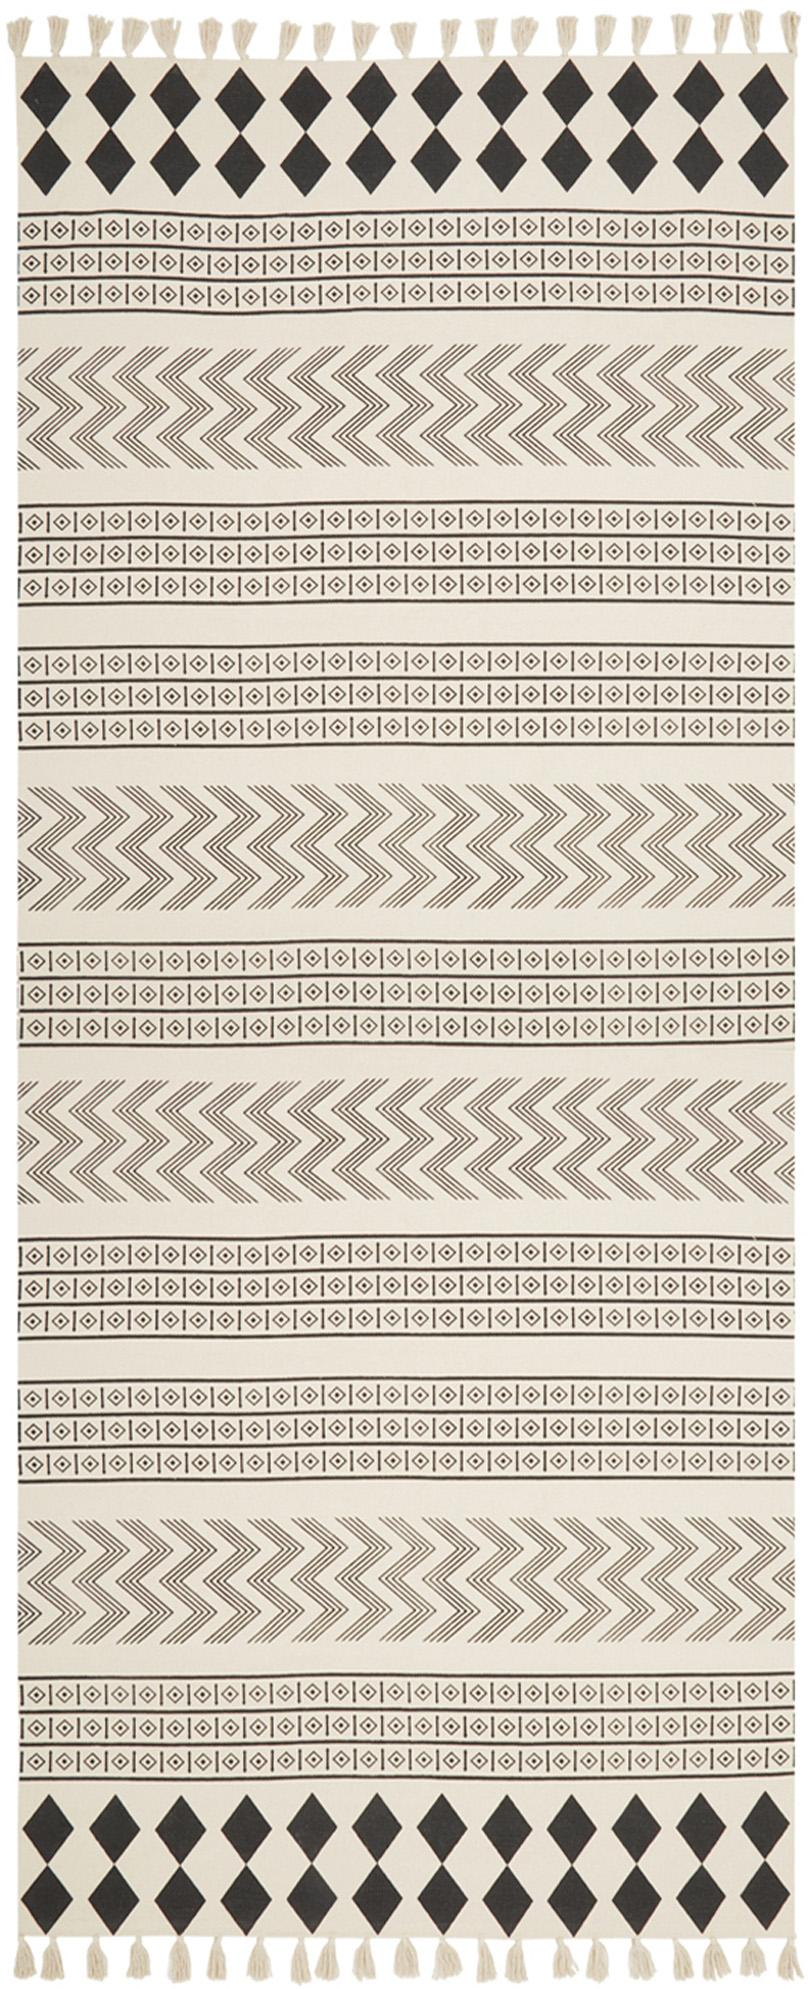 Alfombra artesanal de algodón Edna, Algodón, Blanco crema, negro, An 80 x L 250 cm